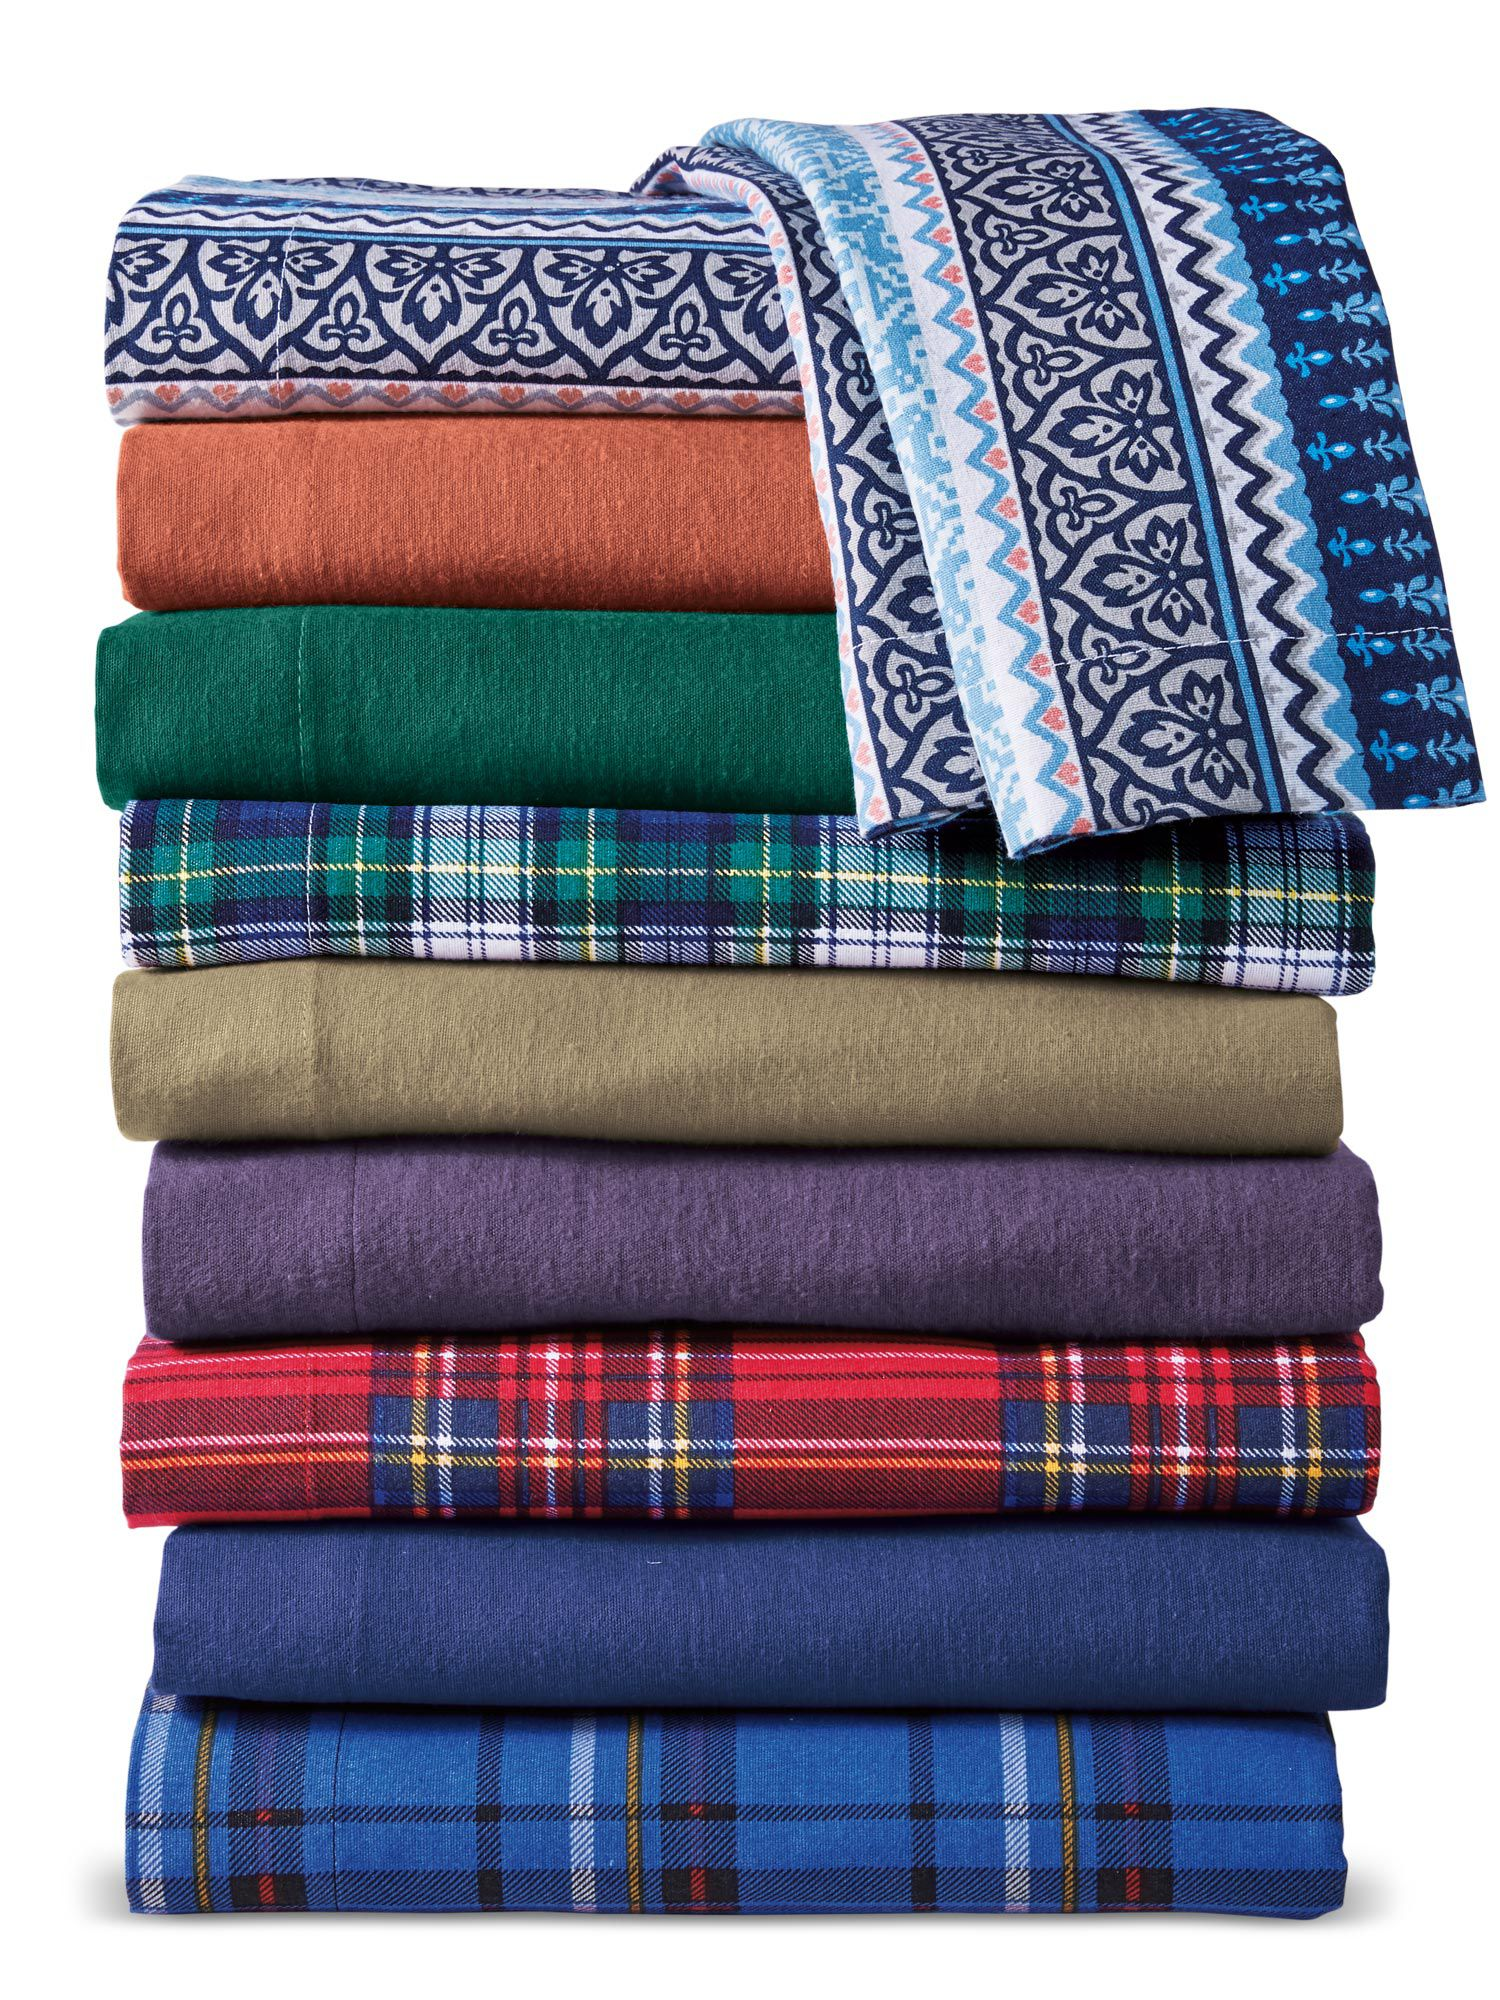 Haband Flannel Sheet Sets